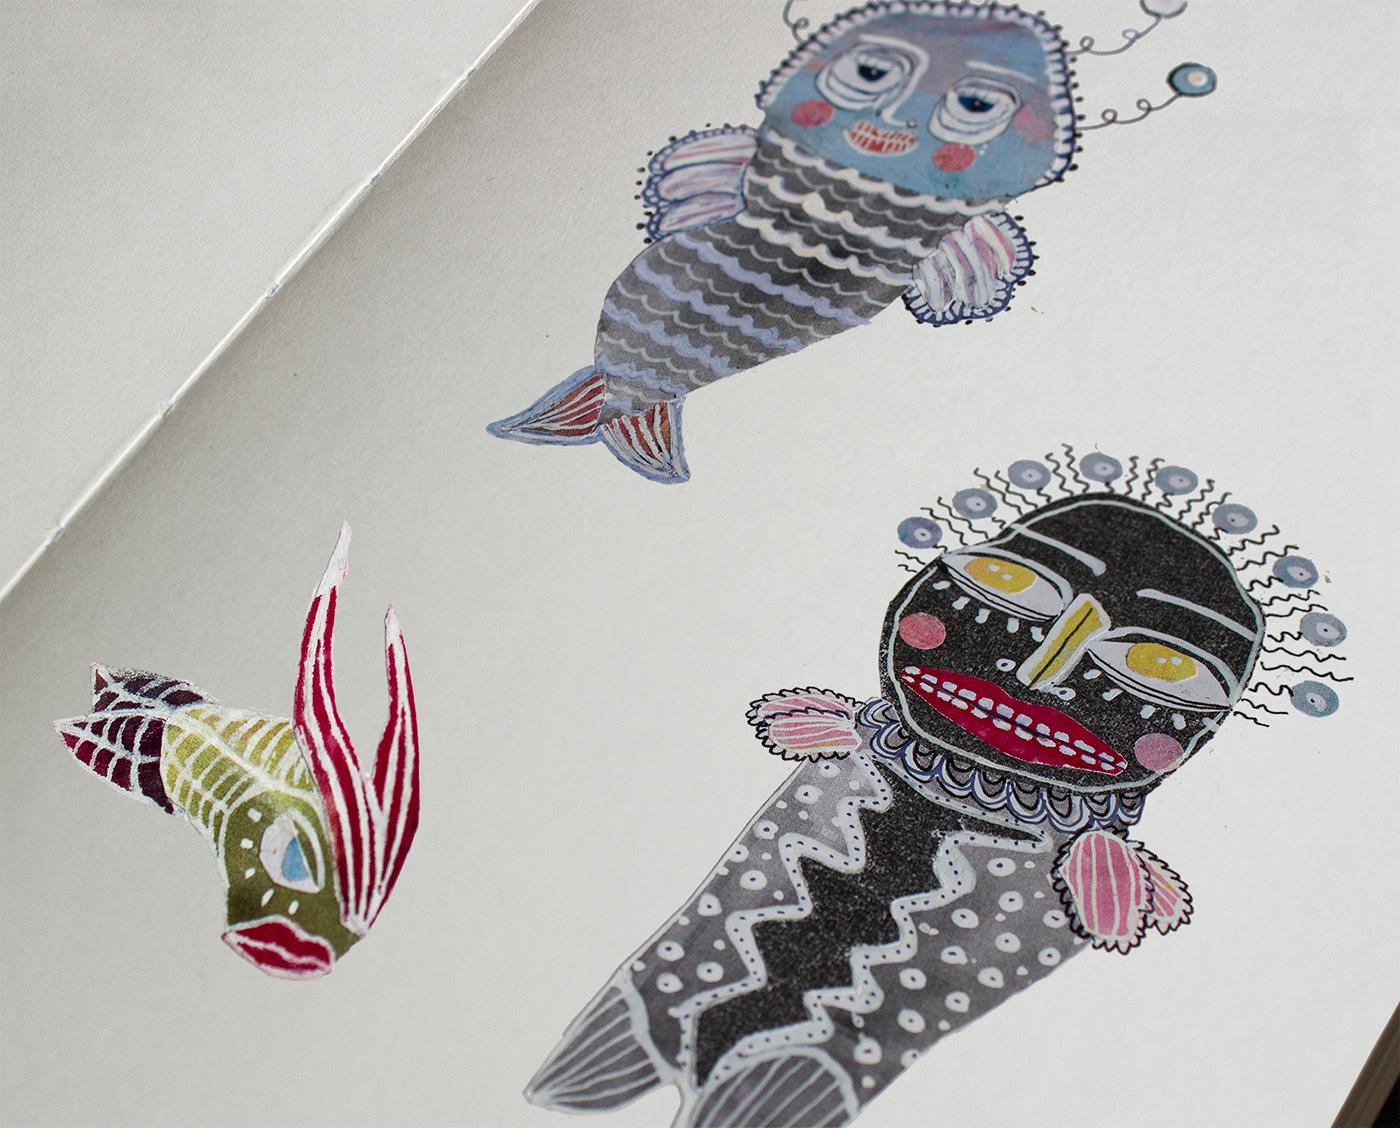 animation_handdrawn_analog_intro_video_cartoon_moving_design_artist_kunstner_graphic_designer_grafisk_designer_marie_broegger_postcard_from_the_deep_sea_sketchbook copy